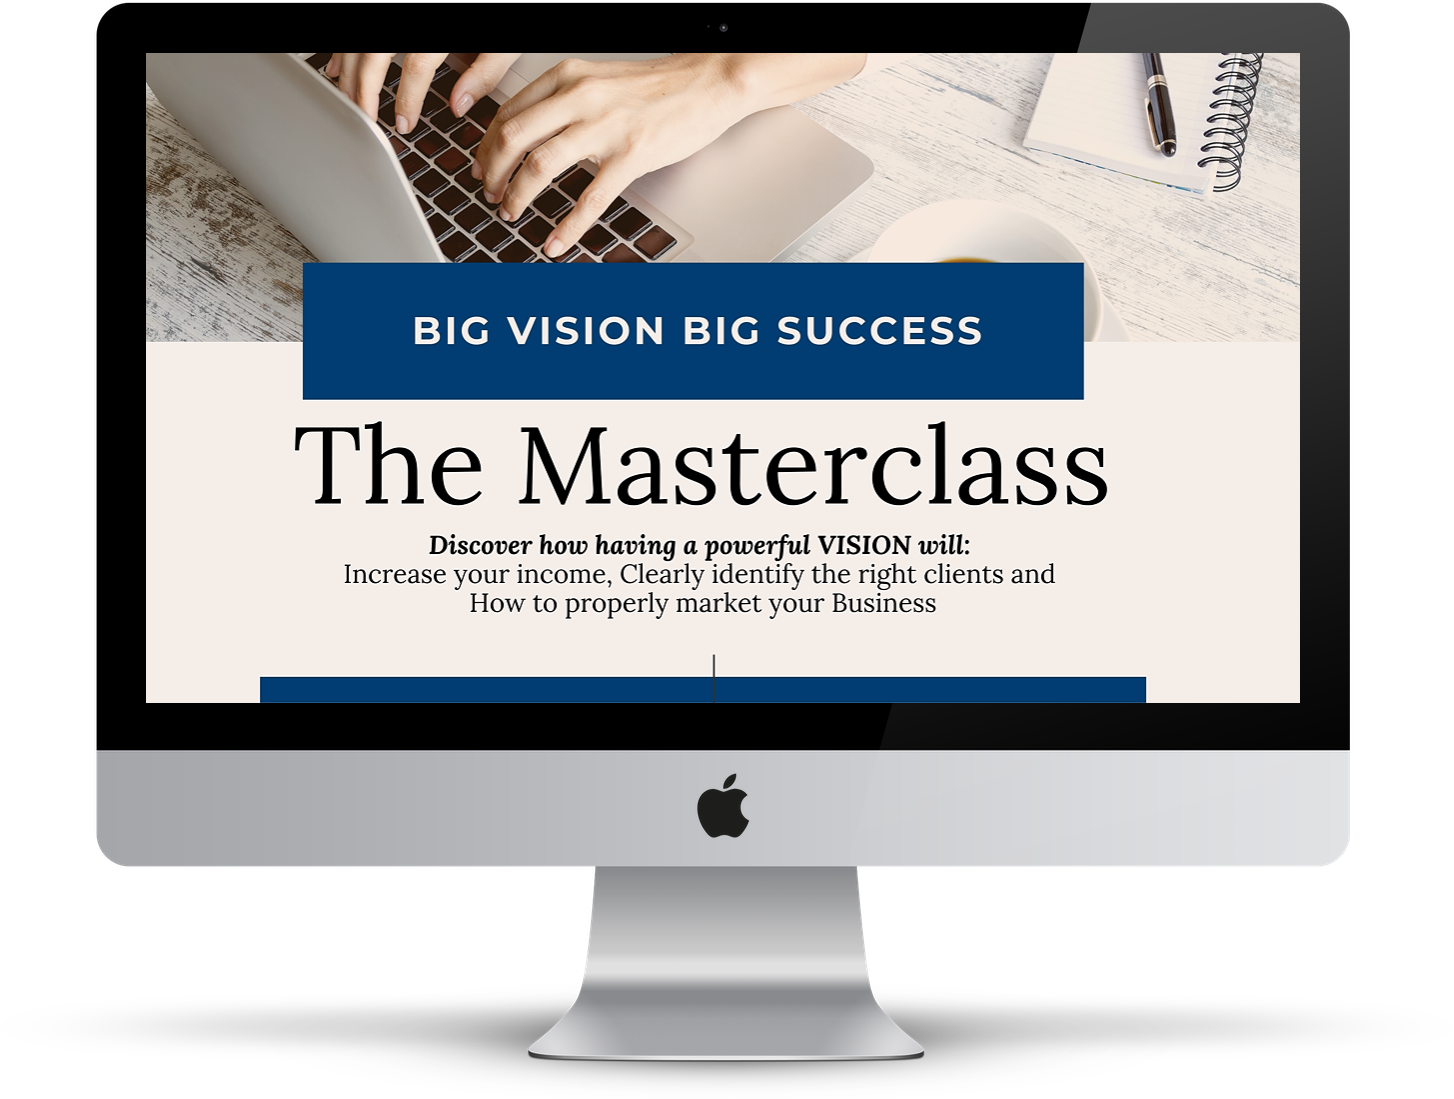 Big Vision Masterclass